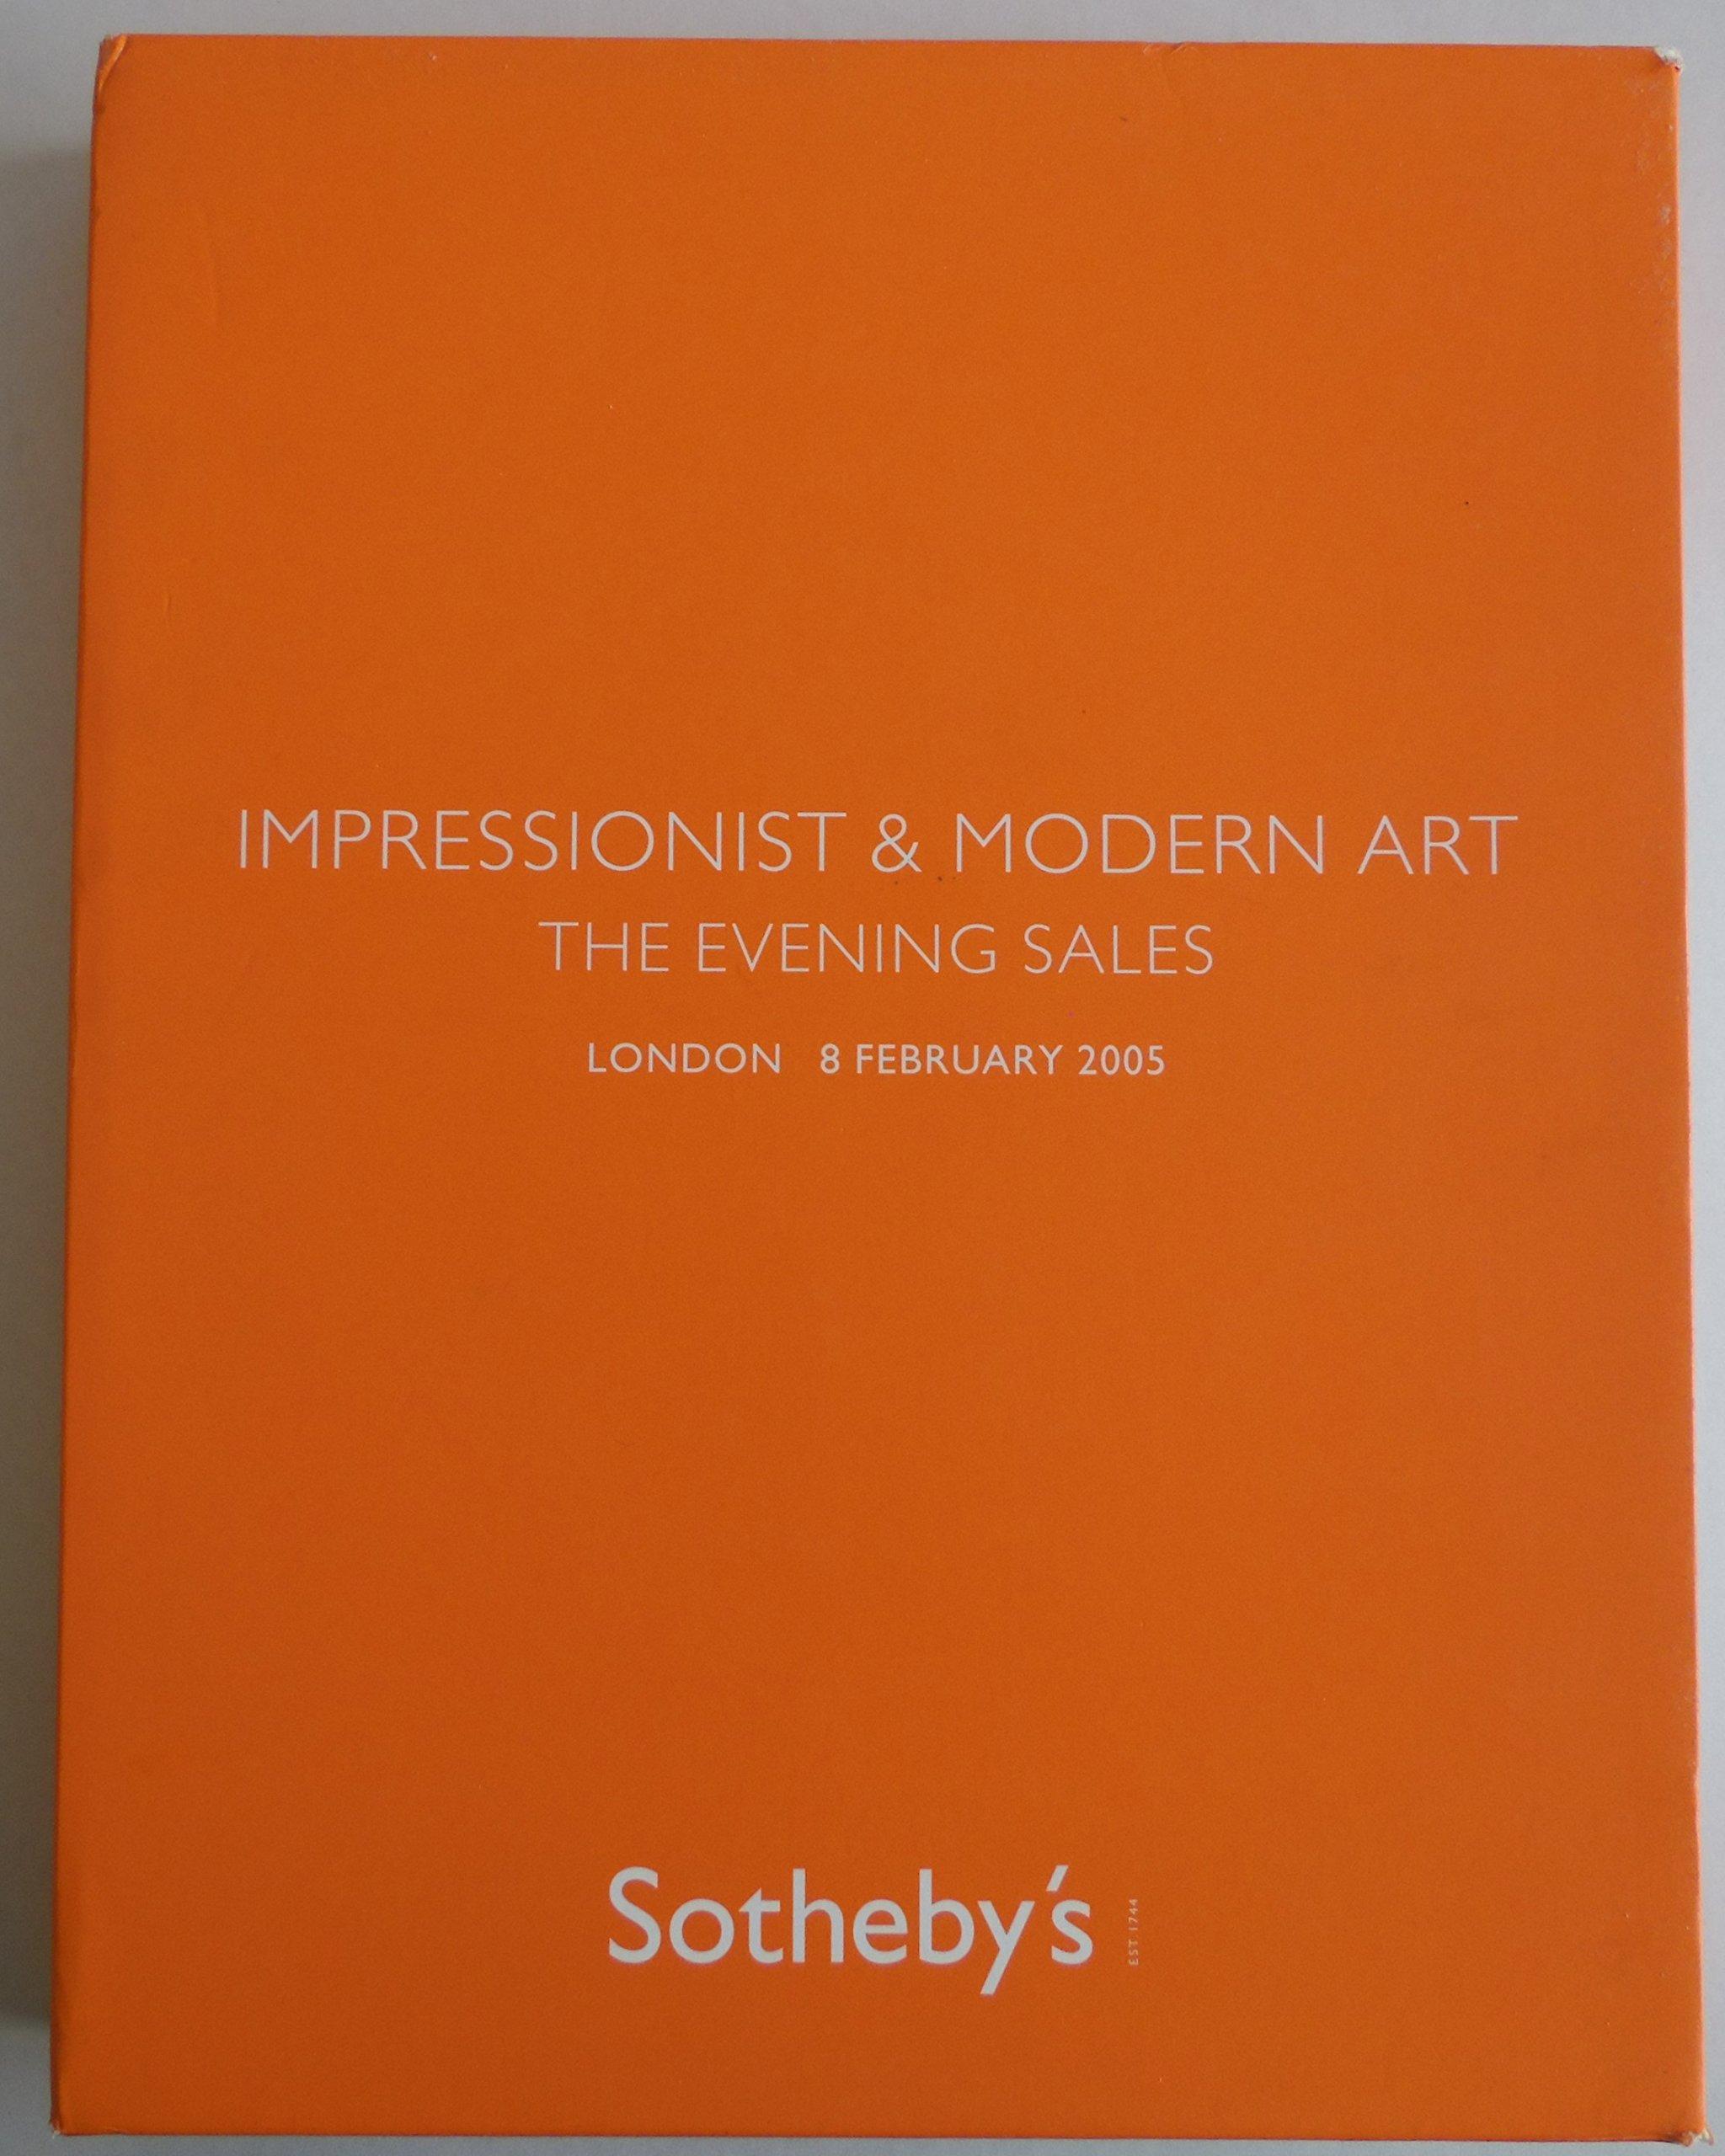 Download Impressionist & Modern Art : The Evening Sale - Surrealist Art, Impressionist & Modern Art Evening Sale, German & Austrian Art - Evening Sale - Sotheby's London - 8 February 2005 - PDF